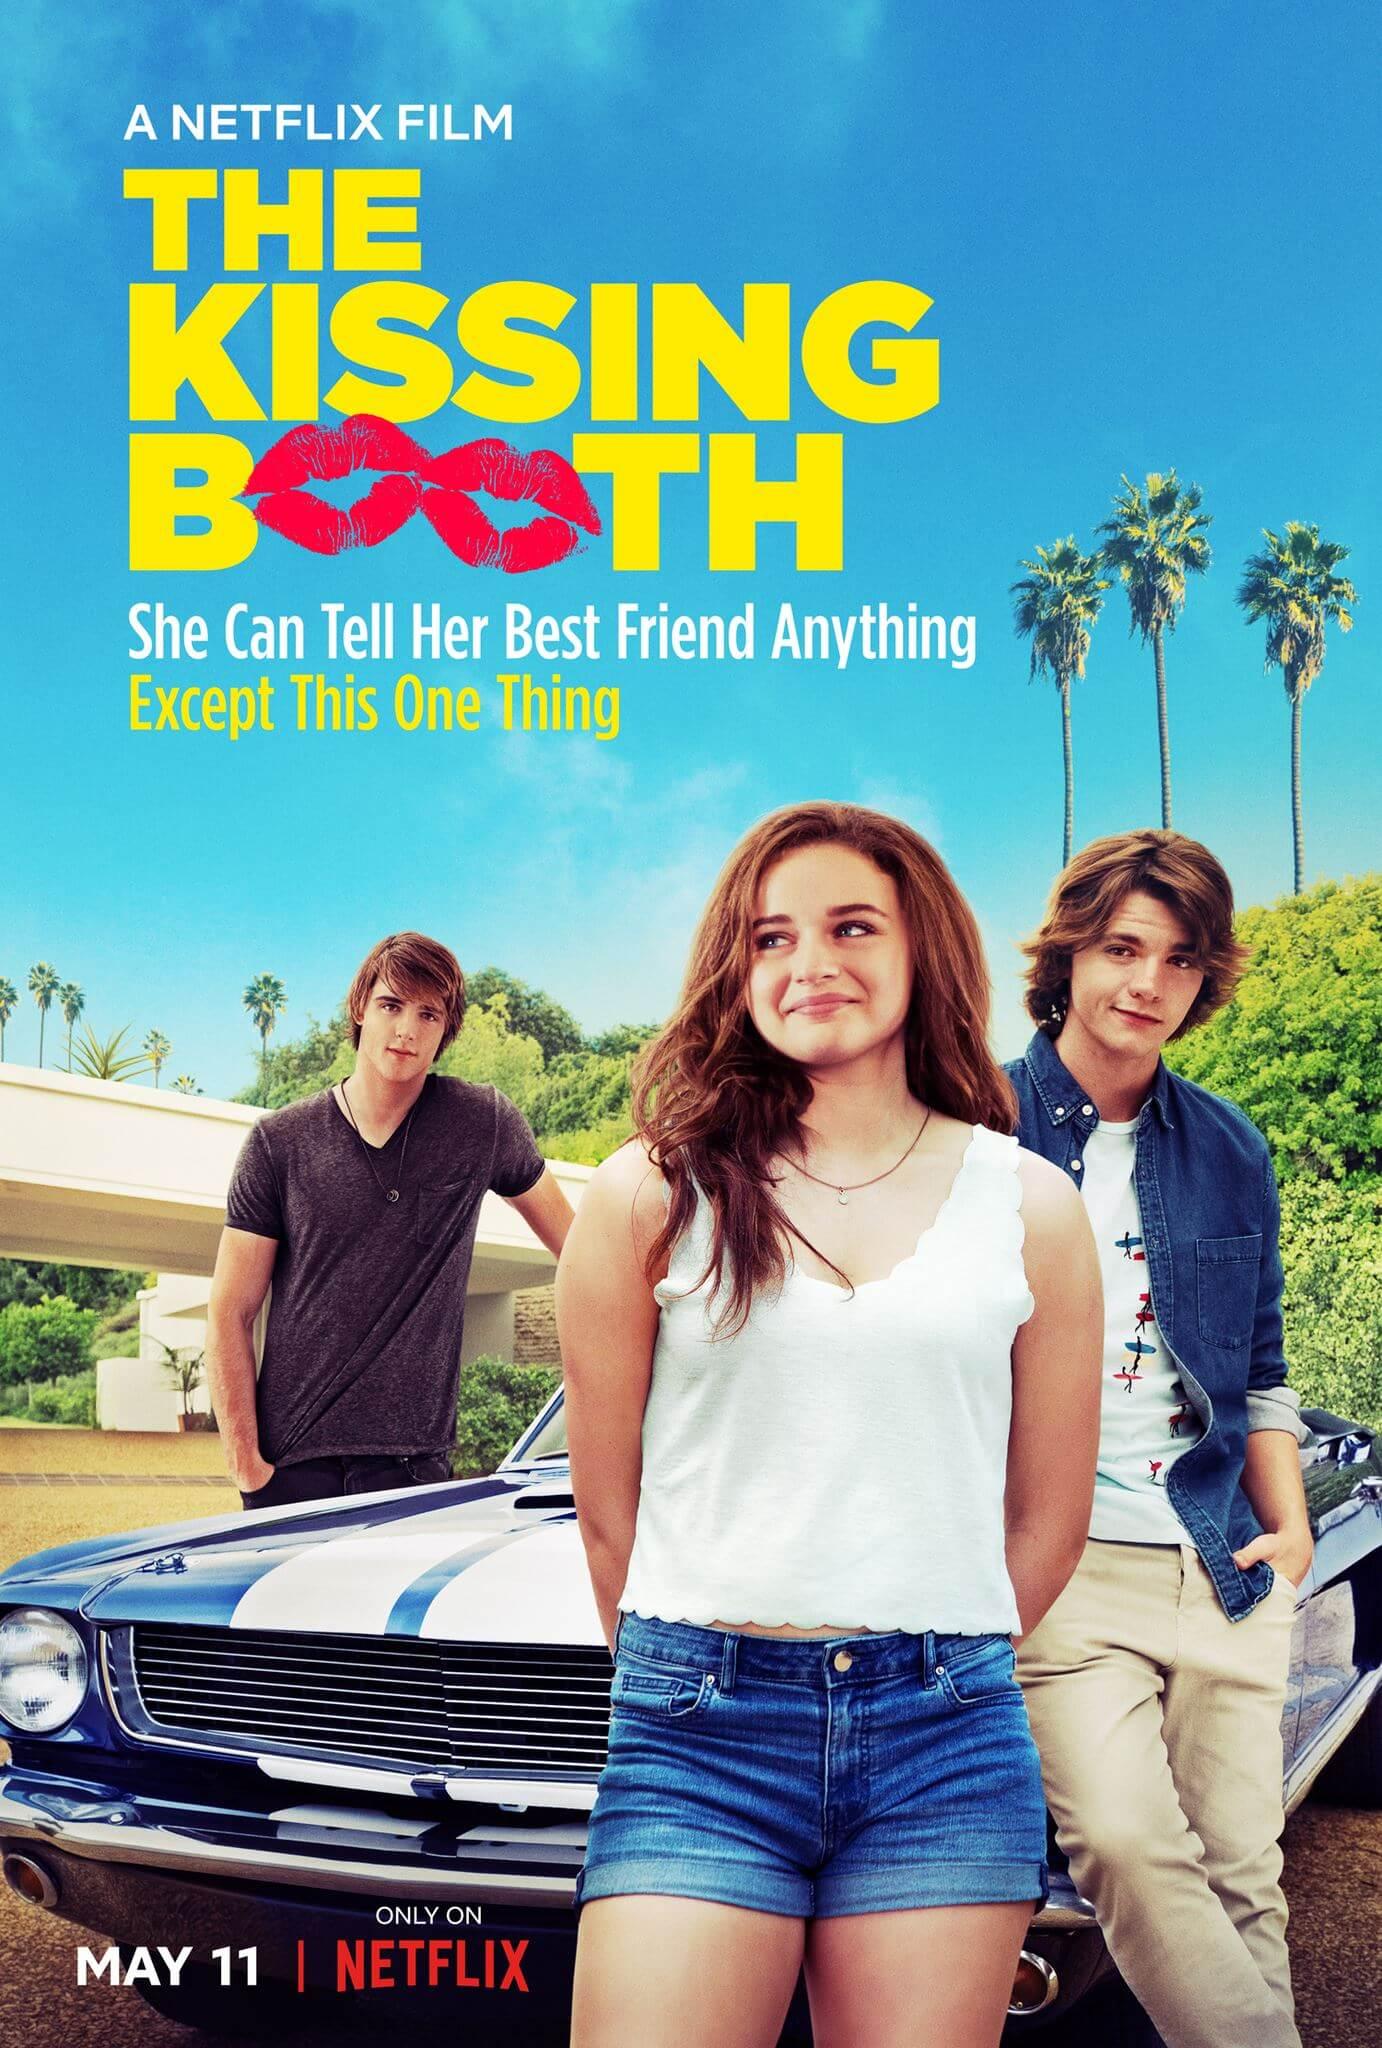 THE KISSING BOOTH (2018) เดอะ คิสซิ่ง บรู (ซับไทย)